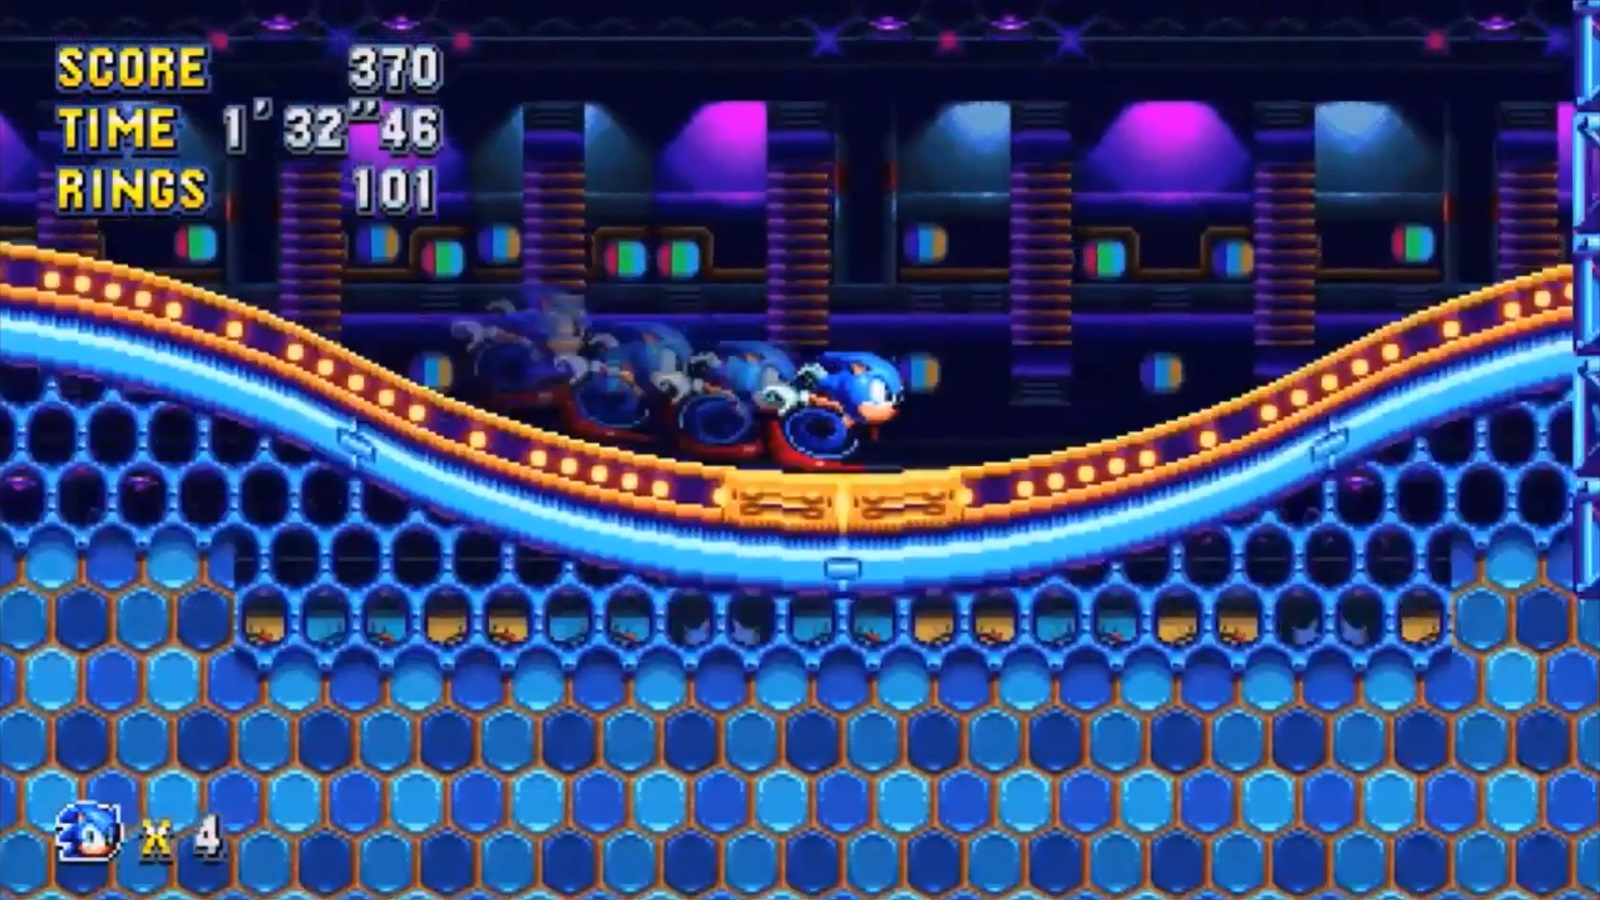 Sonic Mania has a not so nostalgic price screenshot